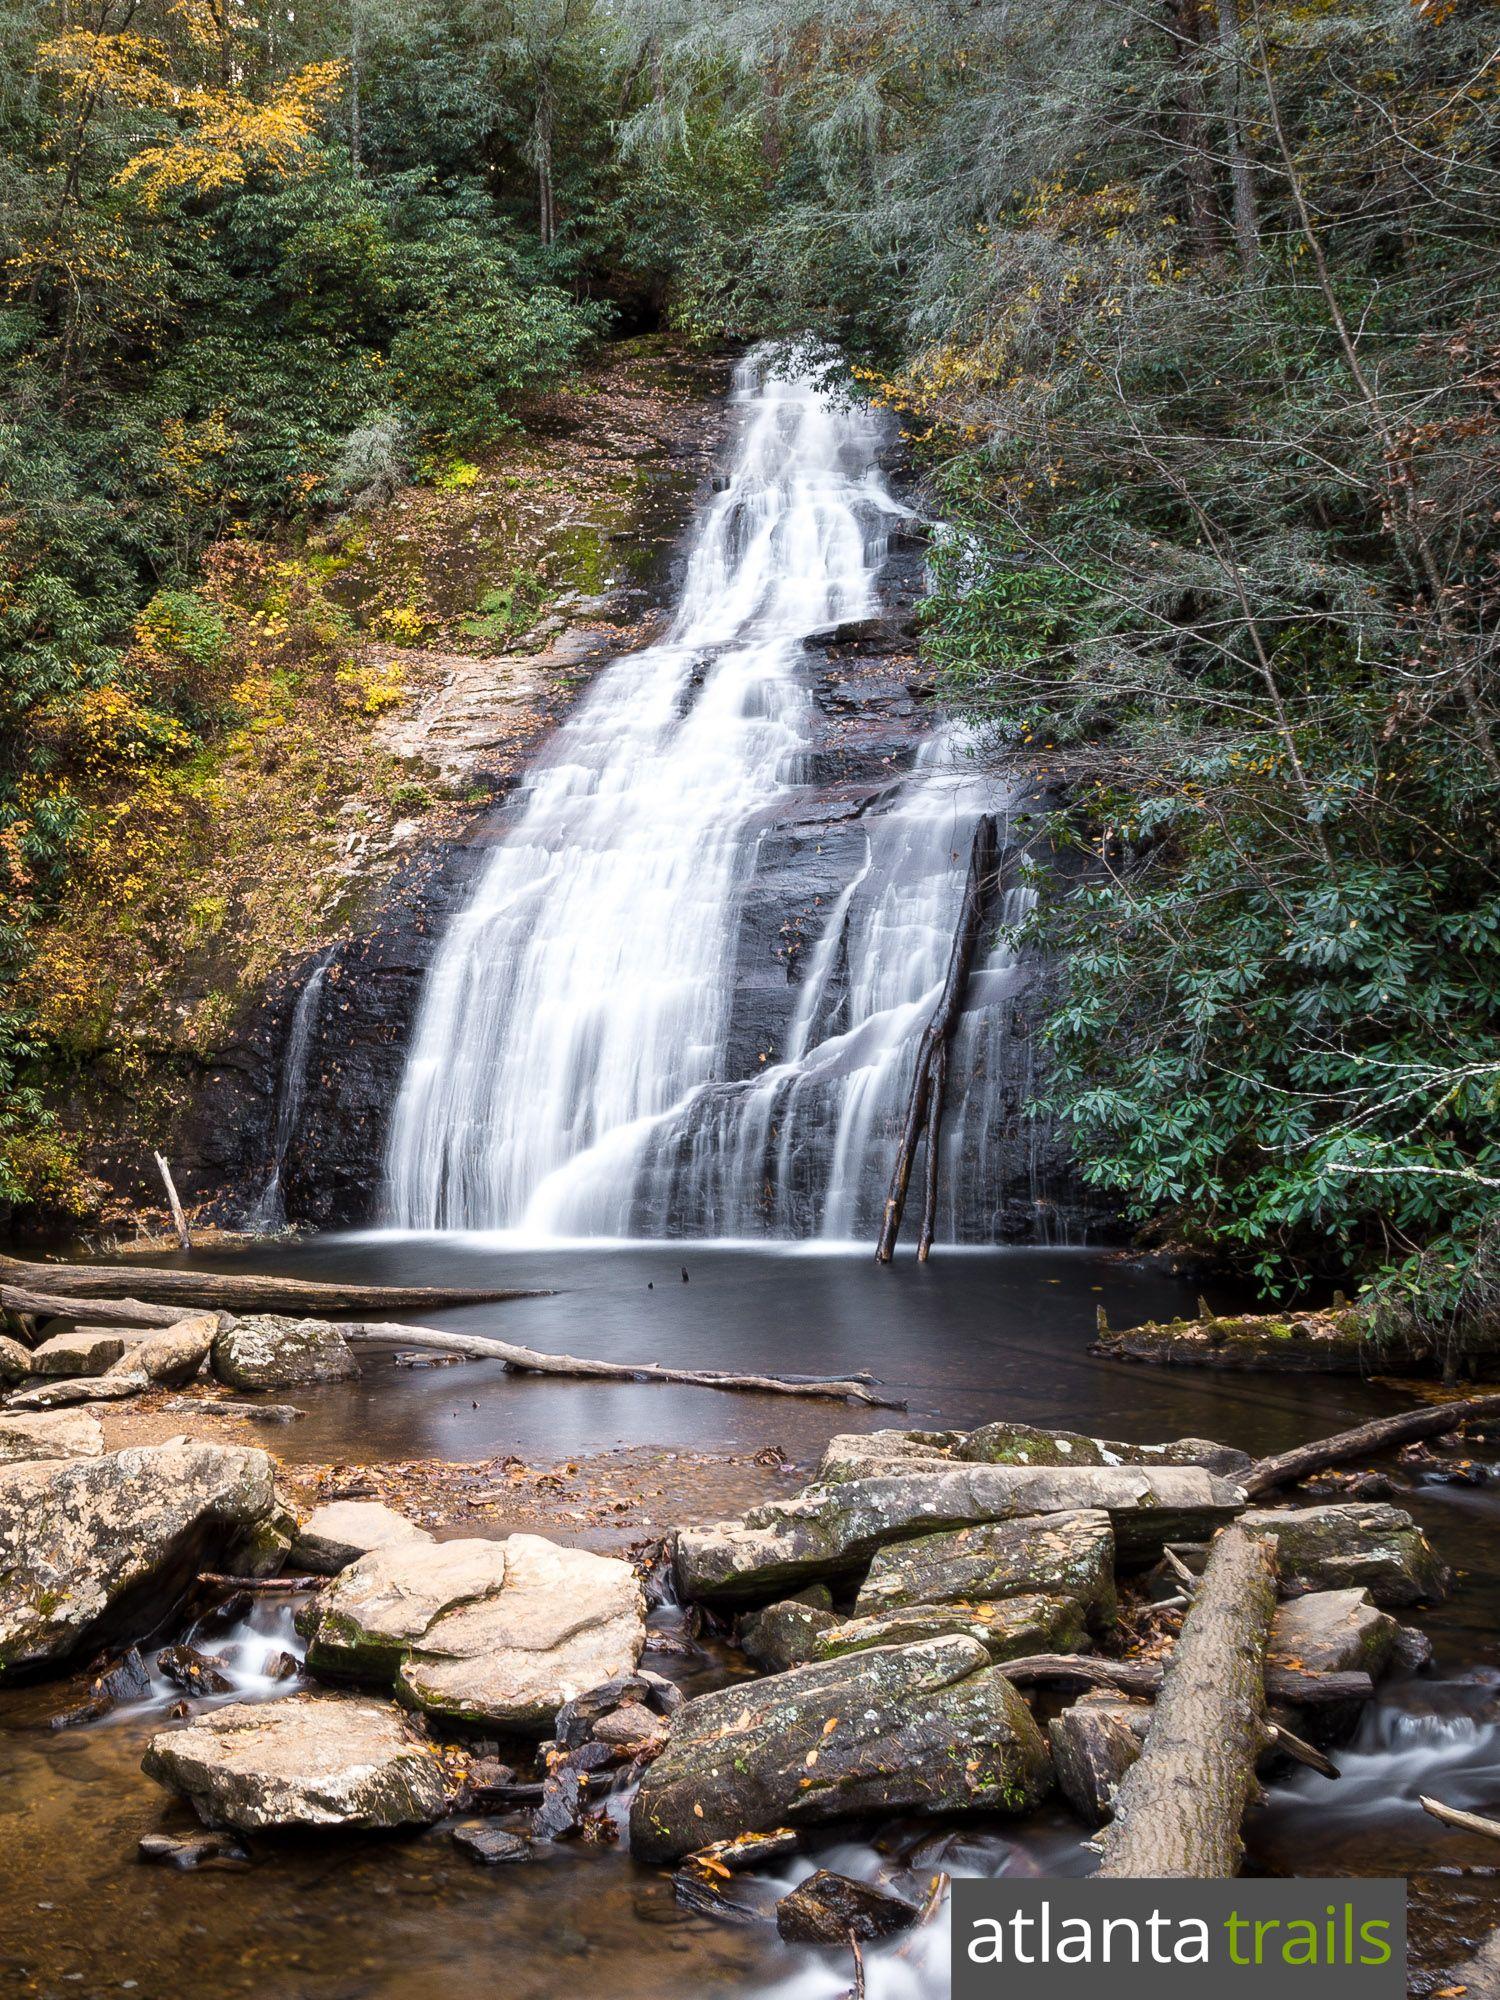 Helton Creek Falls A Family Friendly Double Waterfall Hike Near Helen Ga Hiking In Georgia Waterfall Hikes Georgia Vacation